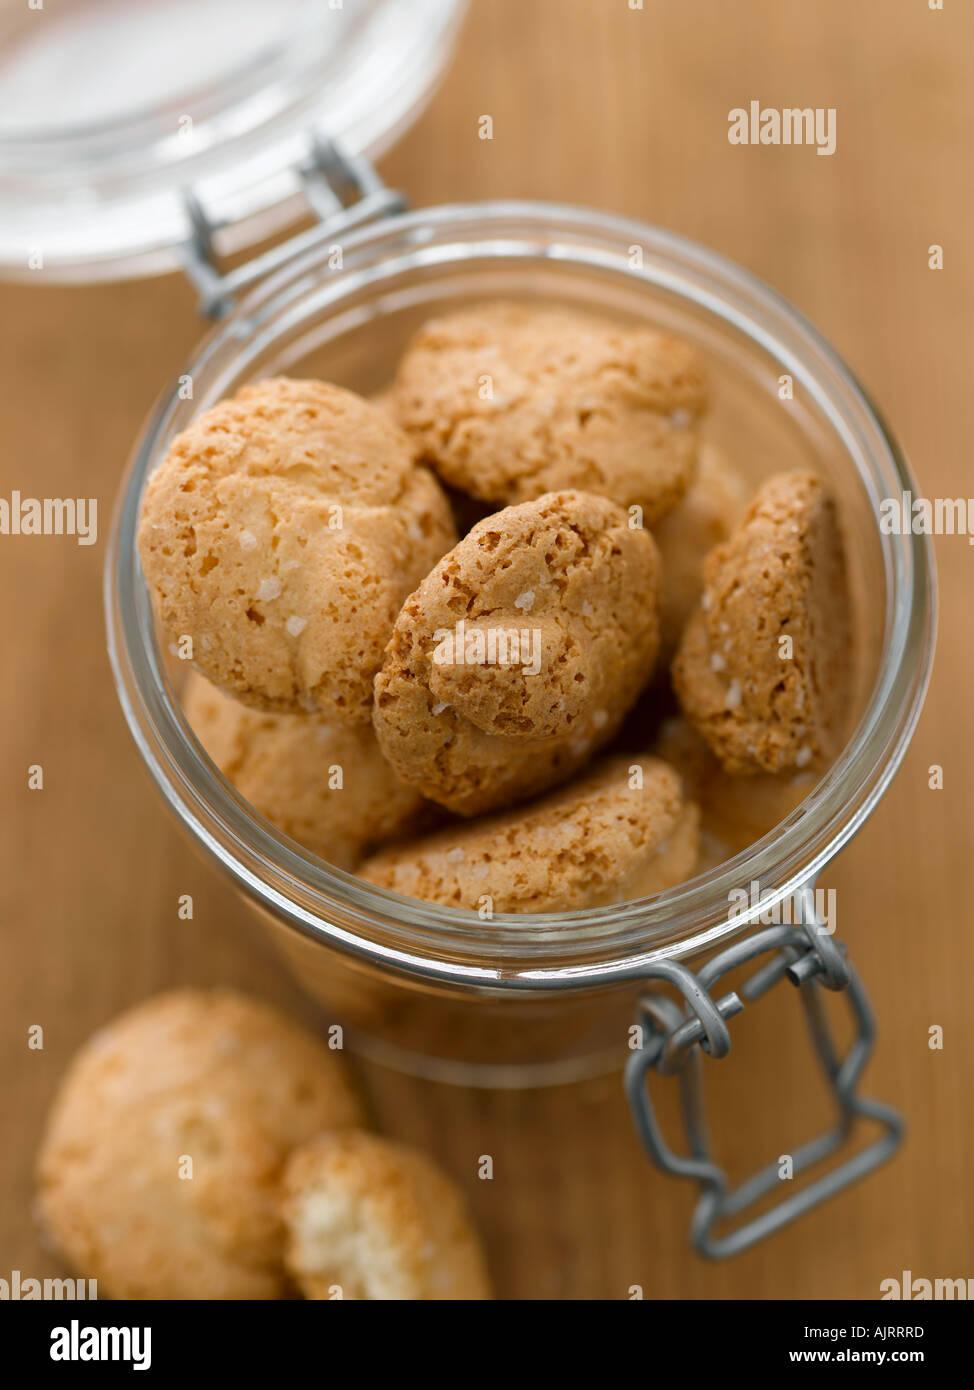 Italian biscotti shot with Hasselblad medium format pro digital camera - Stock Image